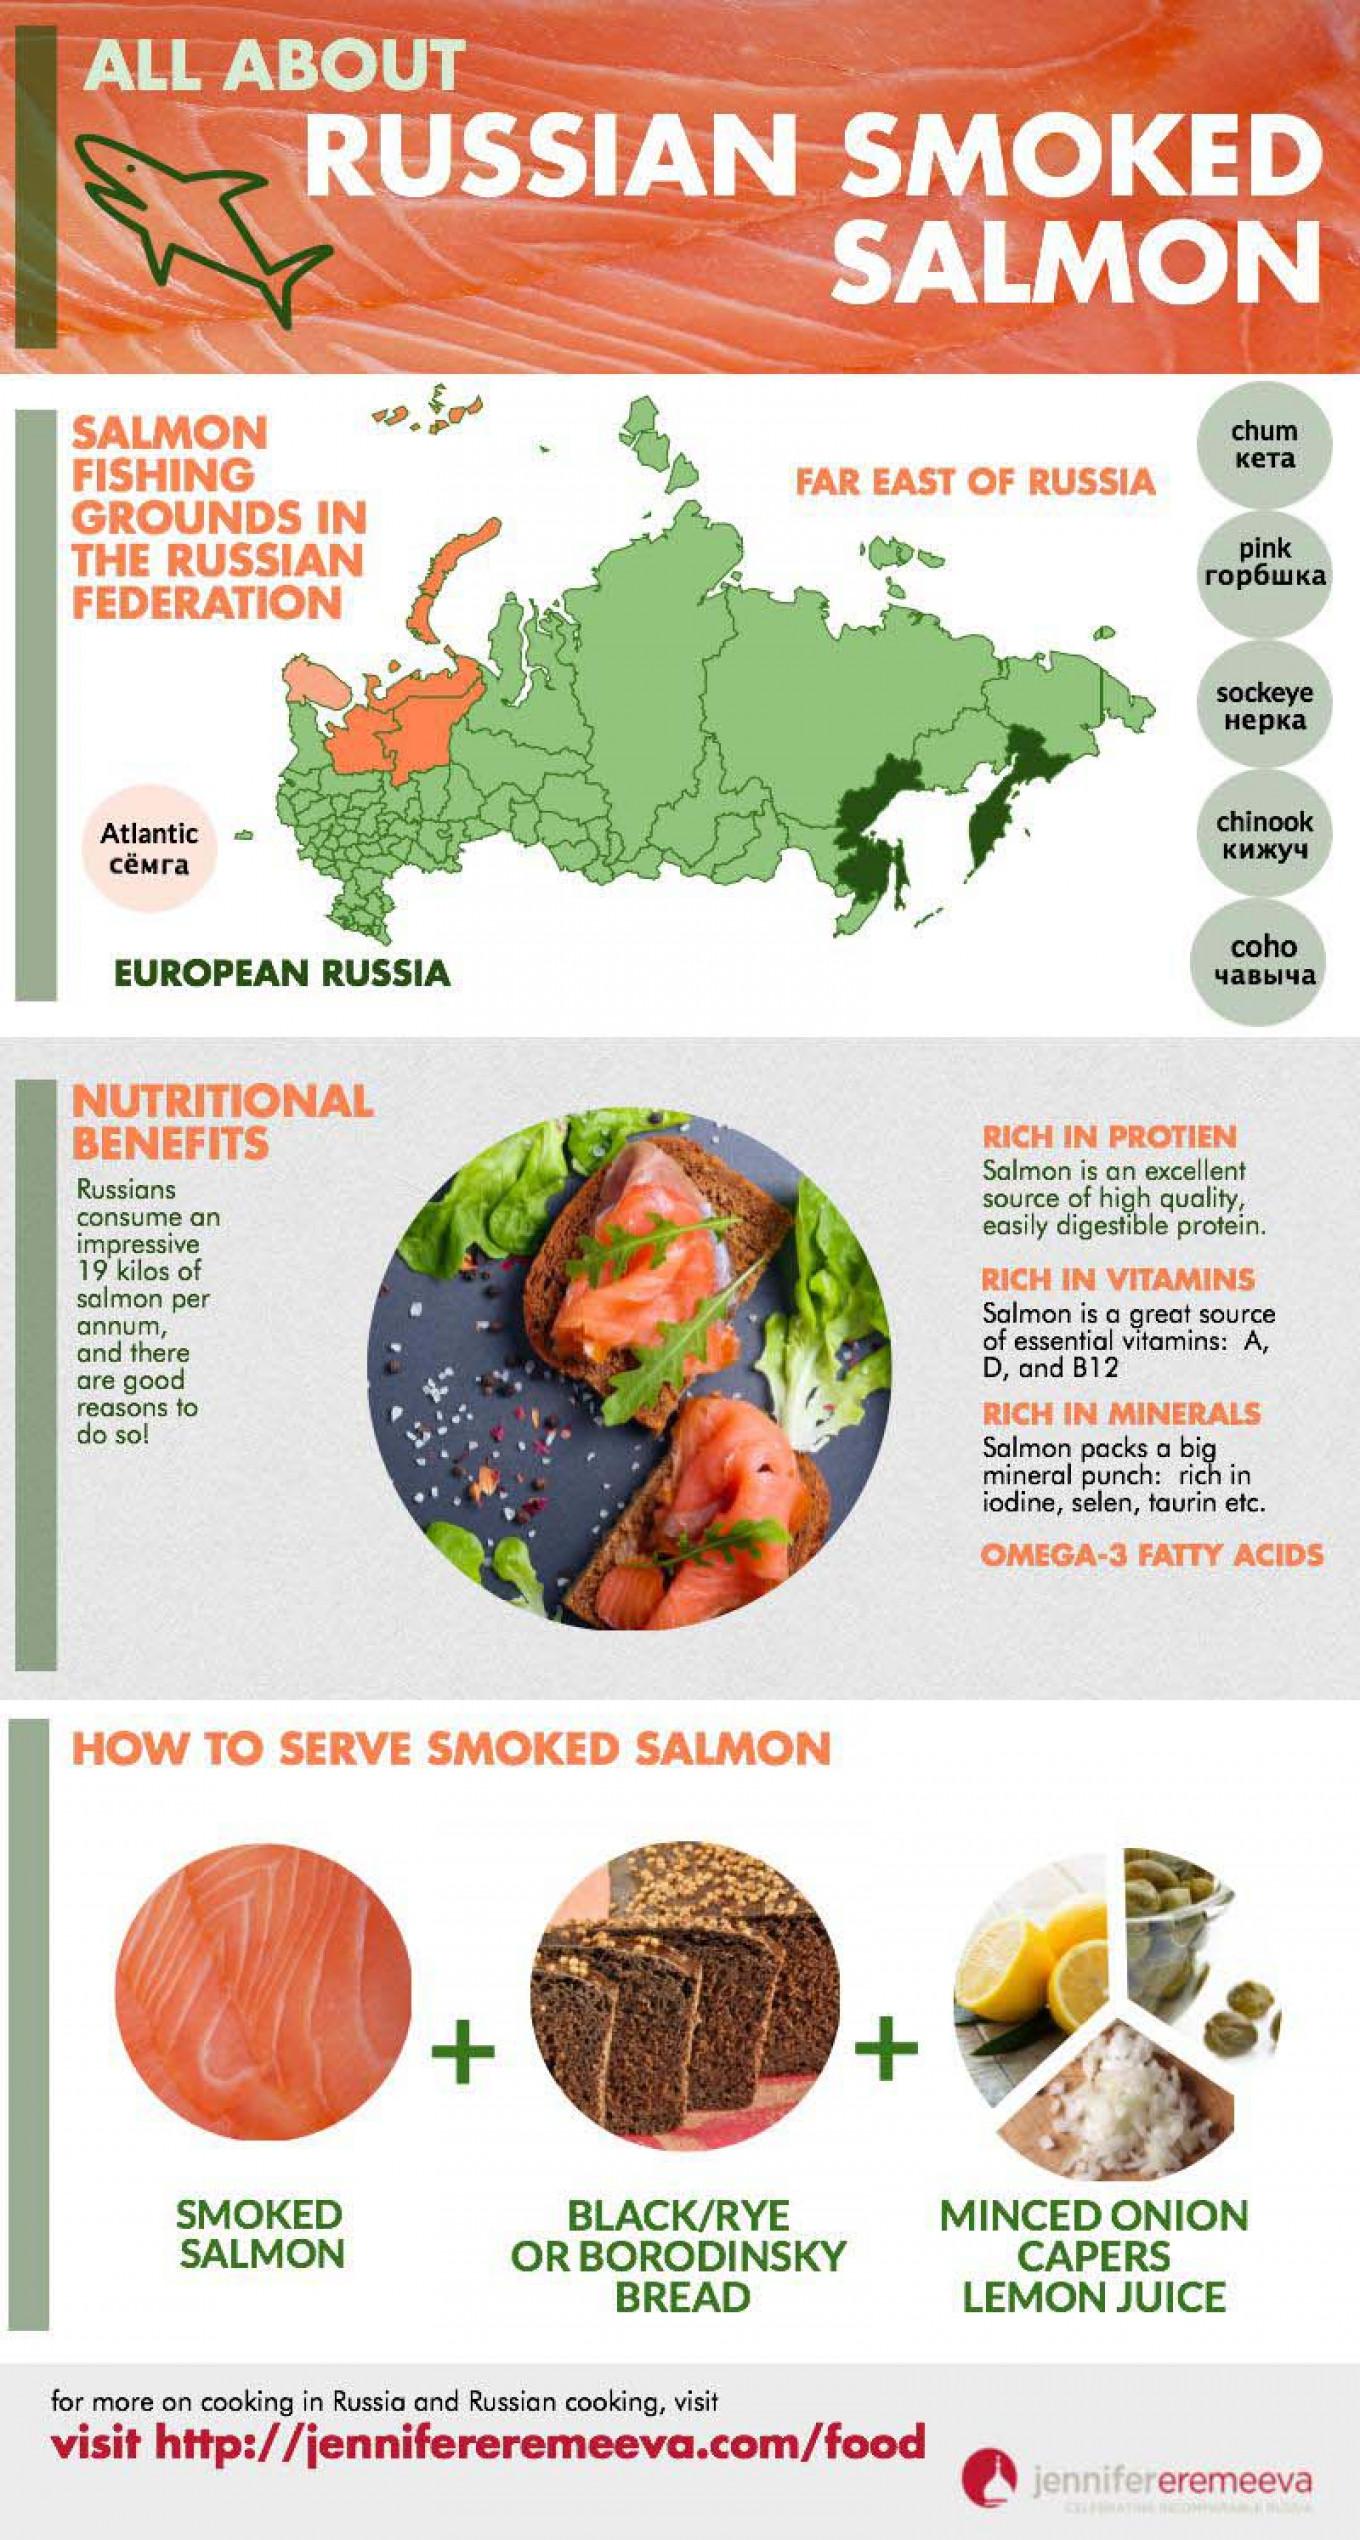 Russia and salmon: a love story  Jennifer Eremeeva / MT